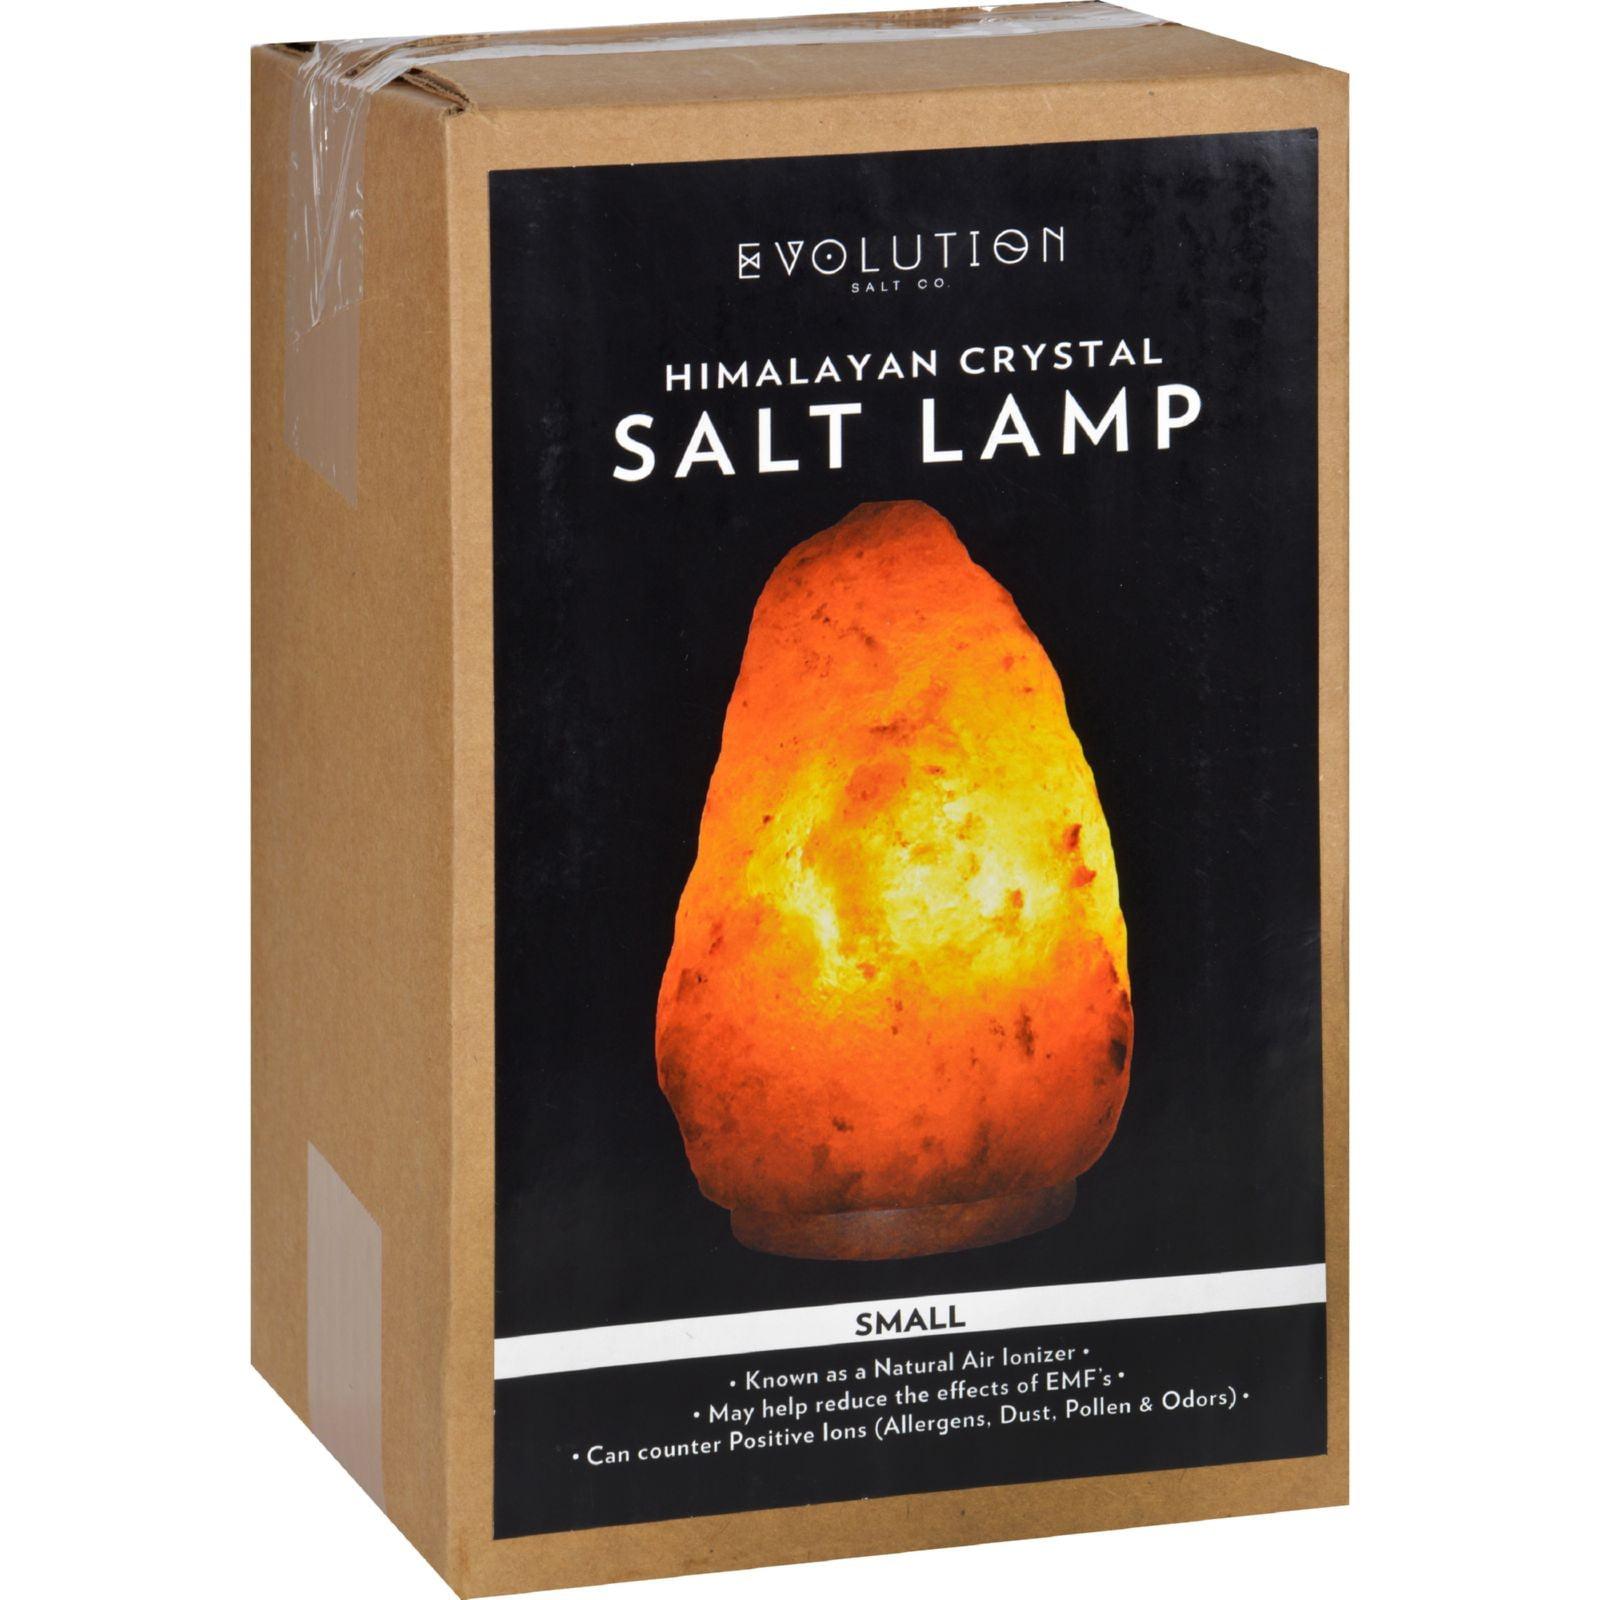 Evolution Salt Lamp, Himalayan Crystal Salt, 6 Lb - Walmart.com